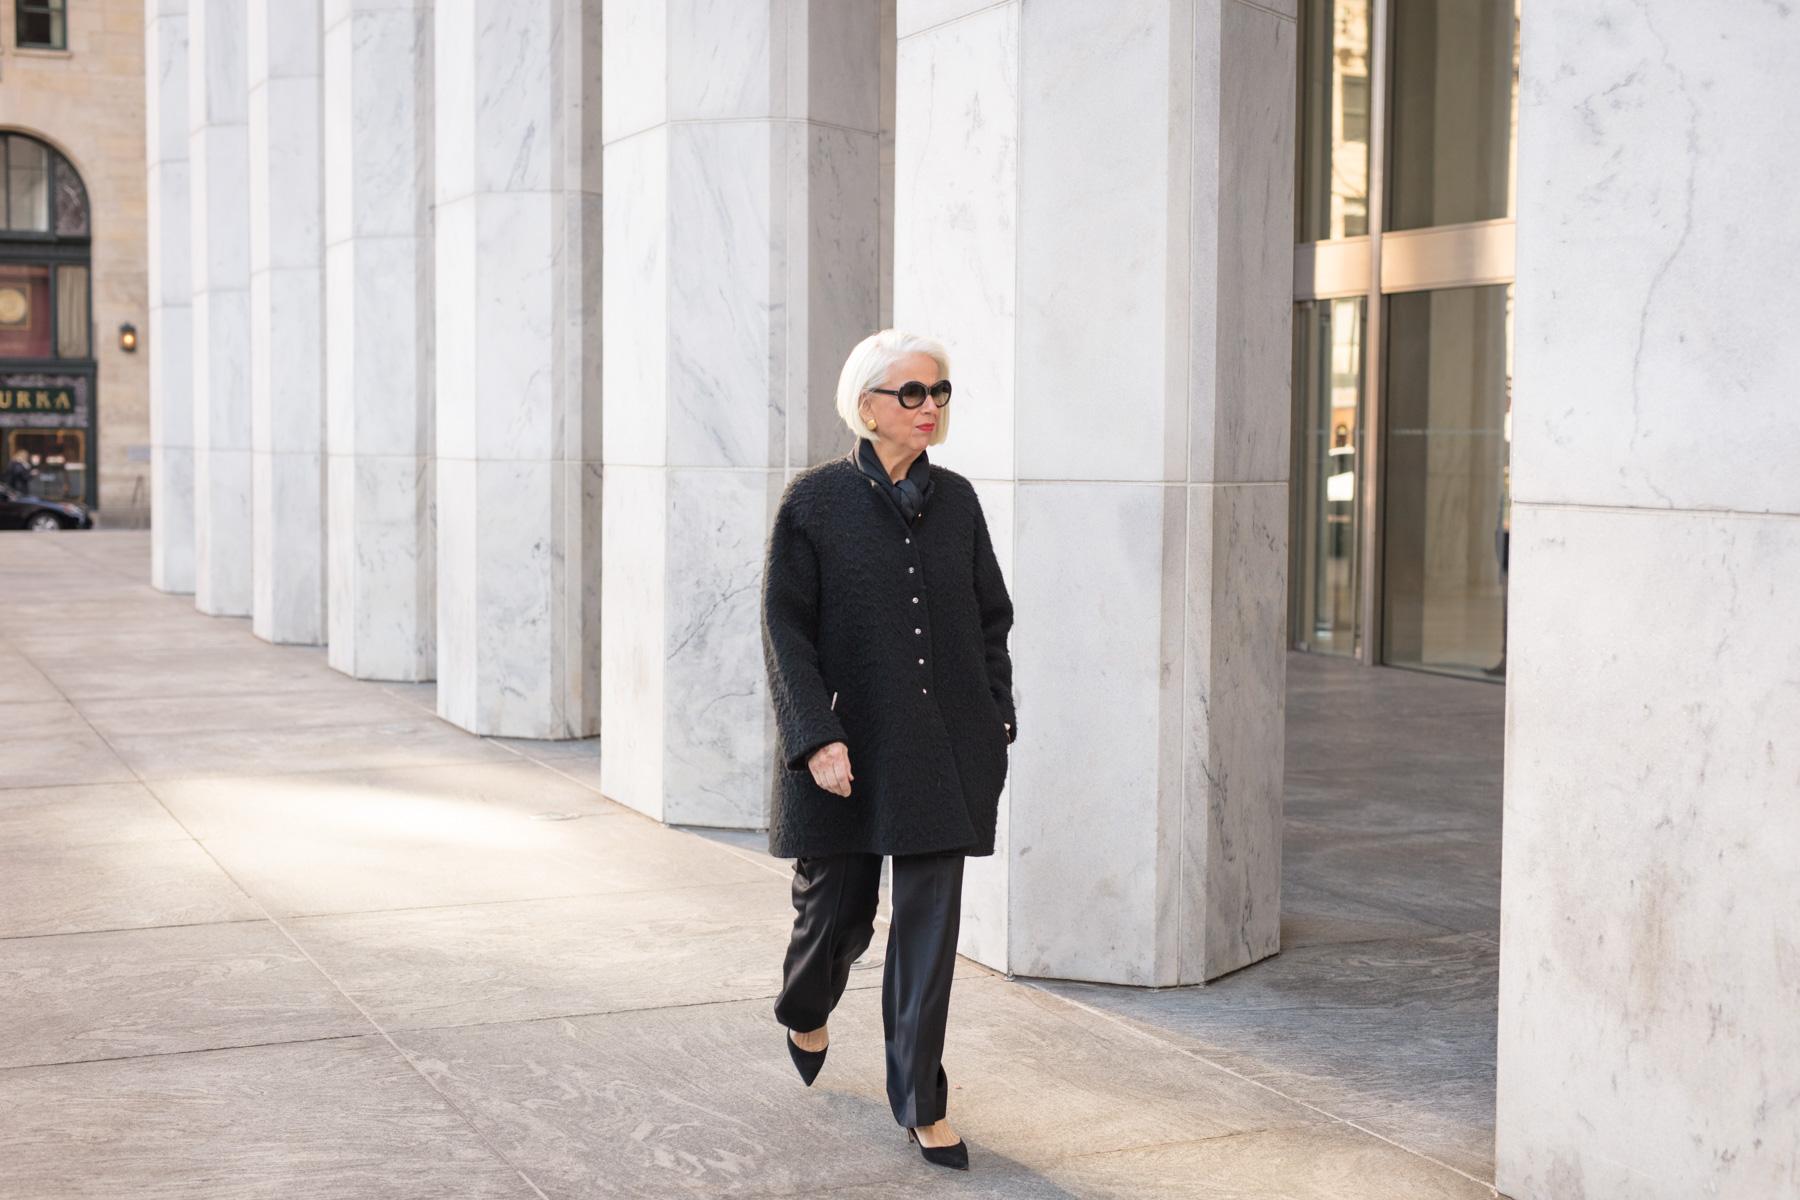 Modern, editorial portraits for NYC law firm stylish elderly lawyer walking on 5th Ave BG